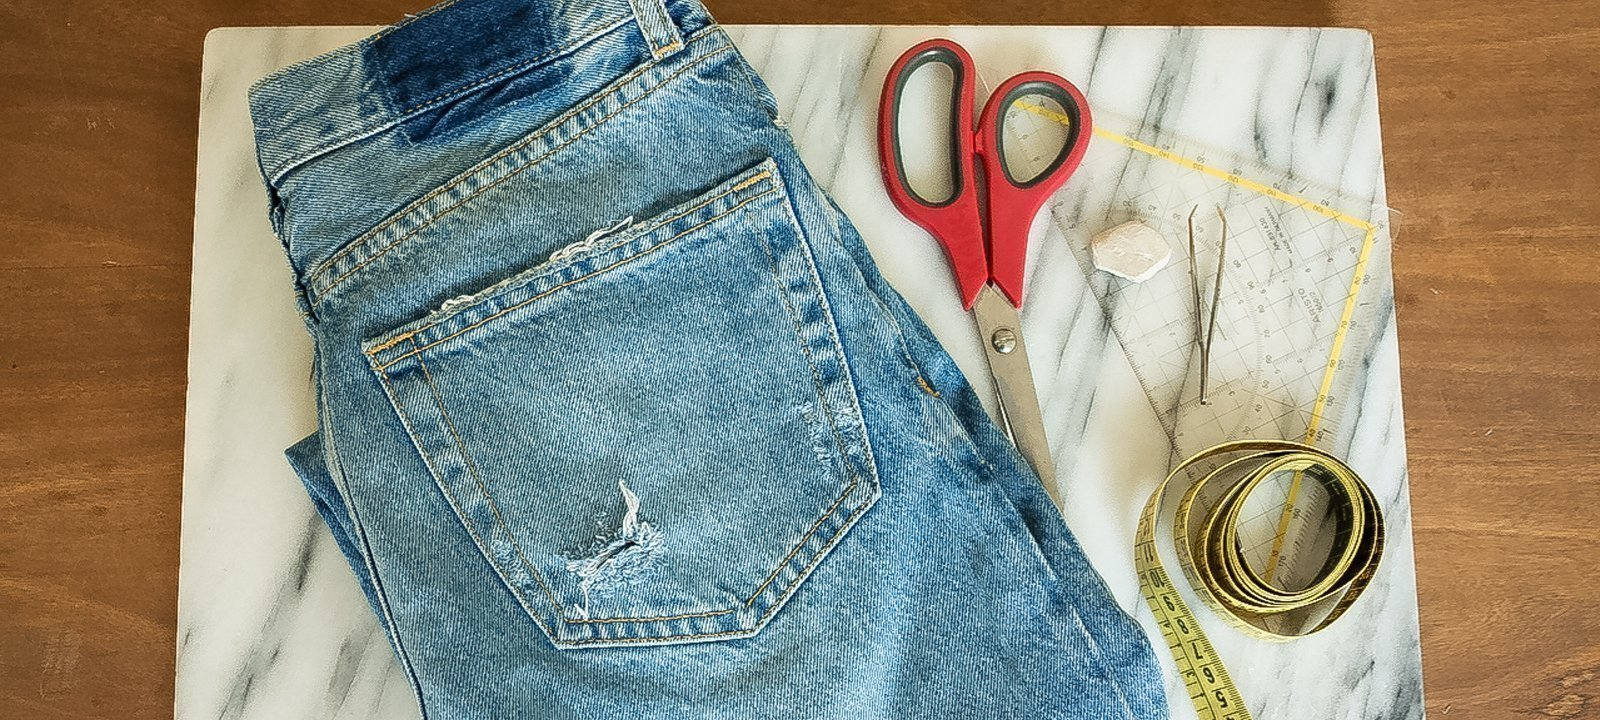 DIY - Jeans